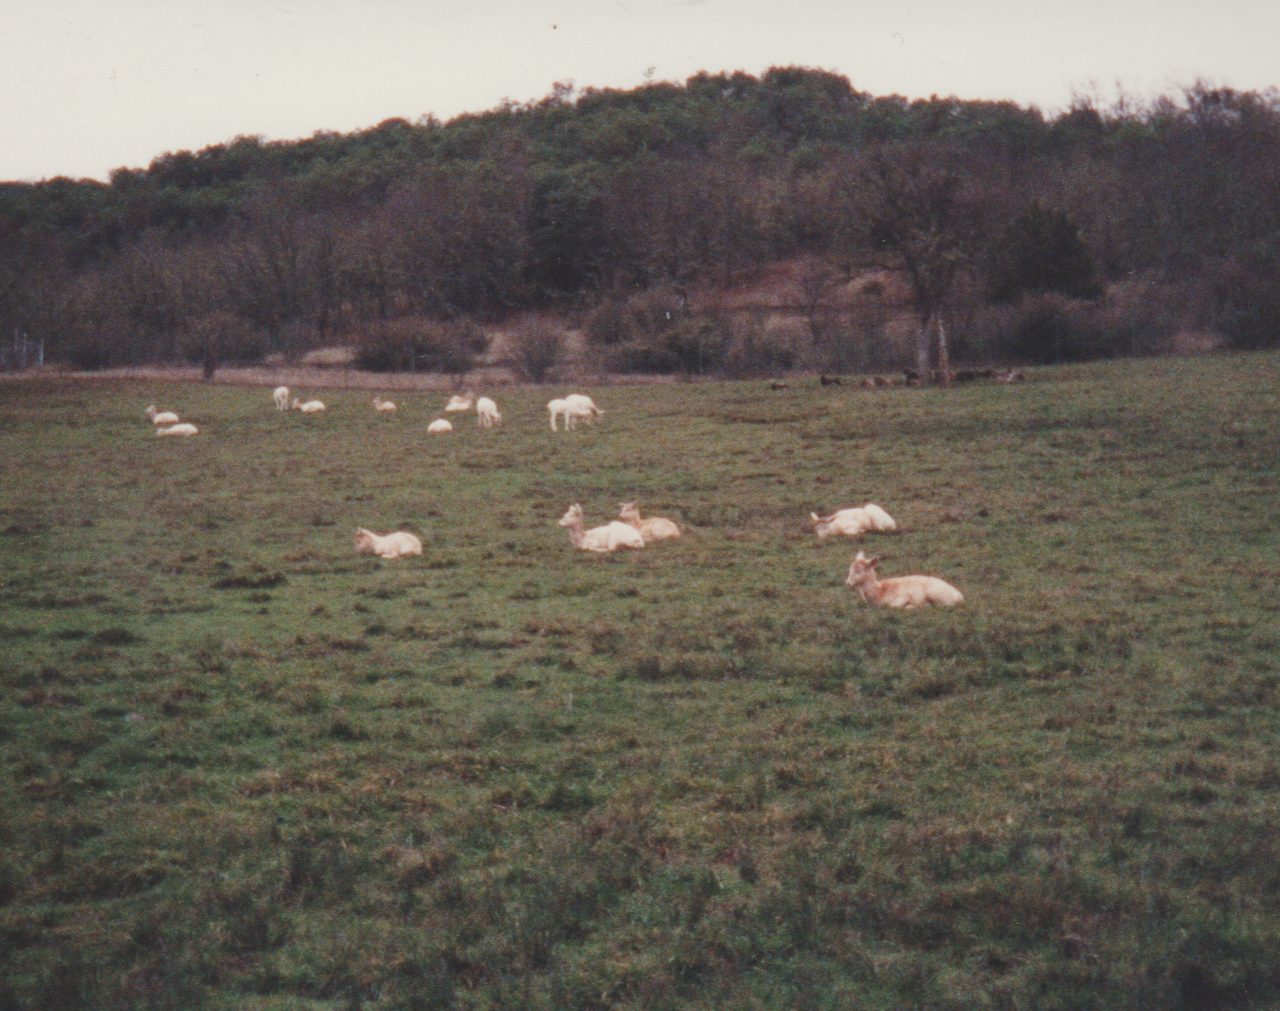 1992-12-26 - Saturday - Wildlife Safari Trip, Marilyn, Crystal-07.png